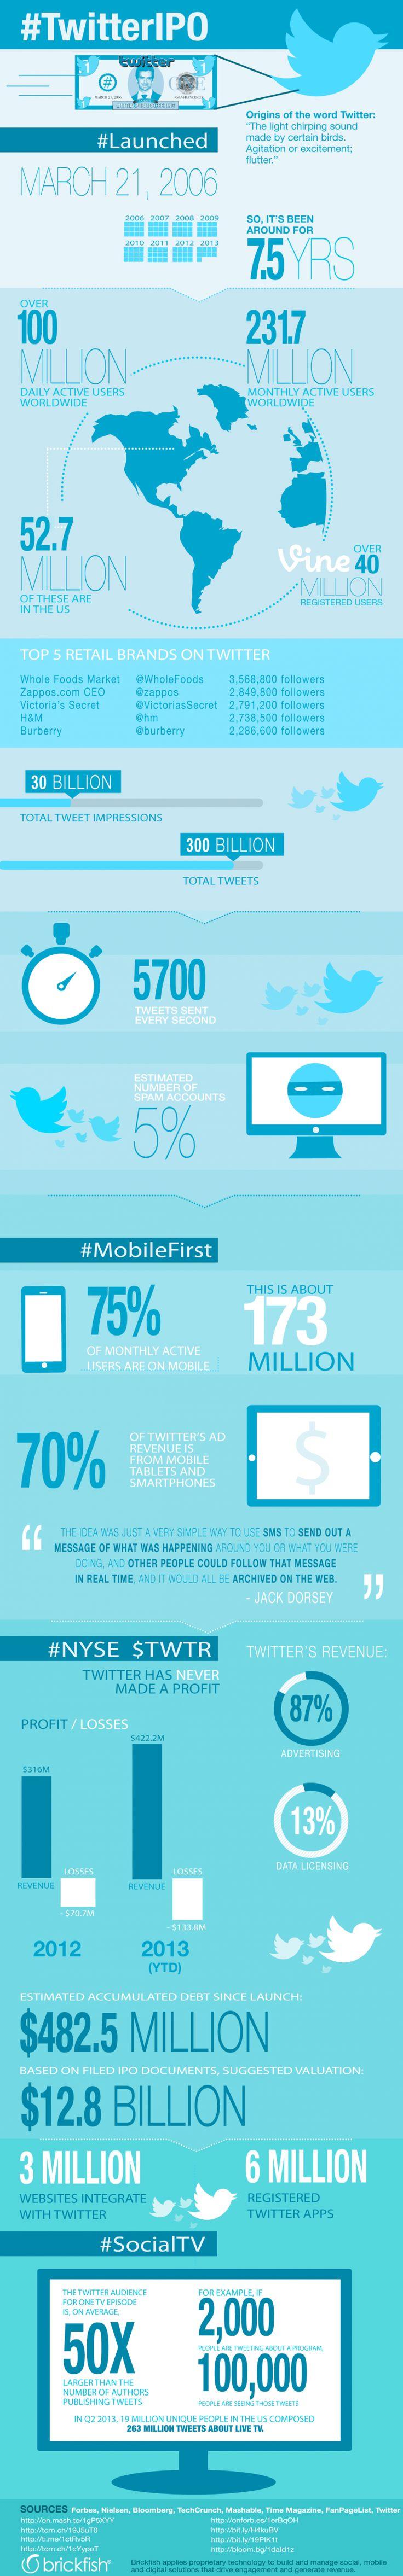 Amazing Twitter Statistics [INFOGRAPHIC]: Infographics Park, Social Media, Smm Stats, Media Infographic, Socialmedia, 2013 Smm, Amazing Twitter